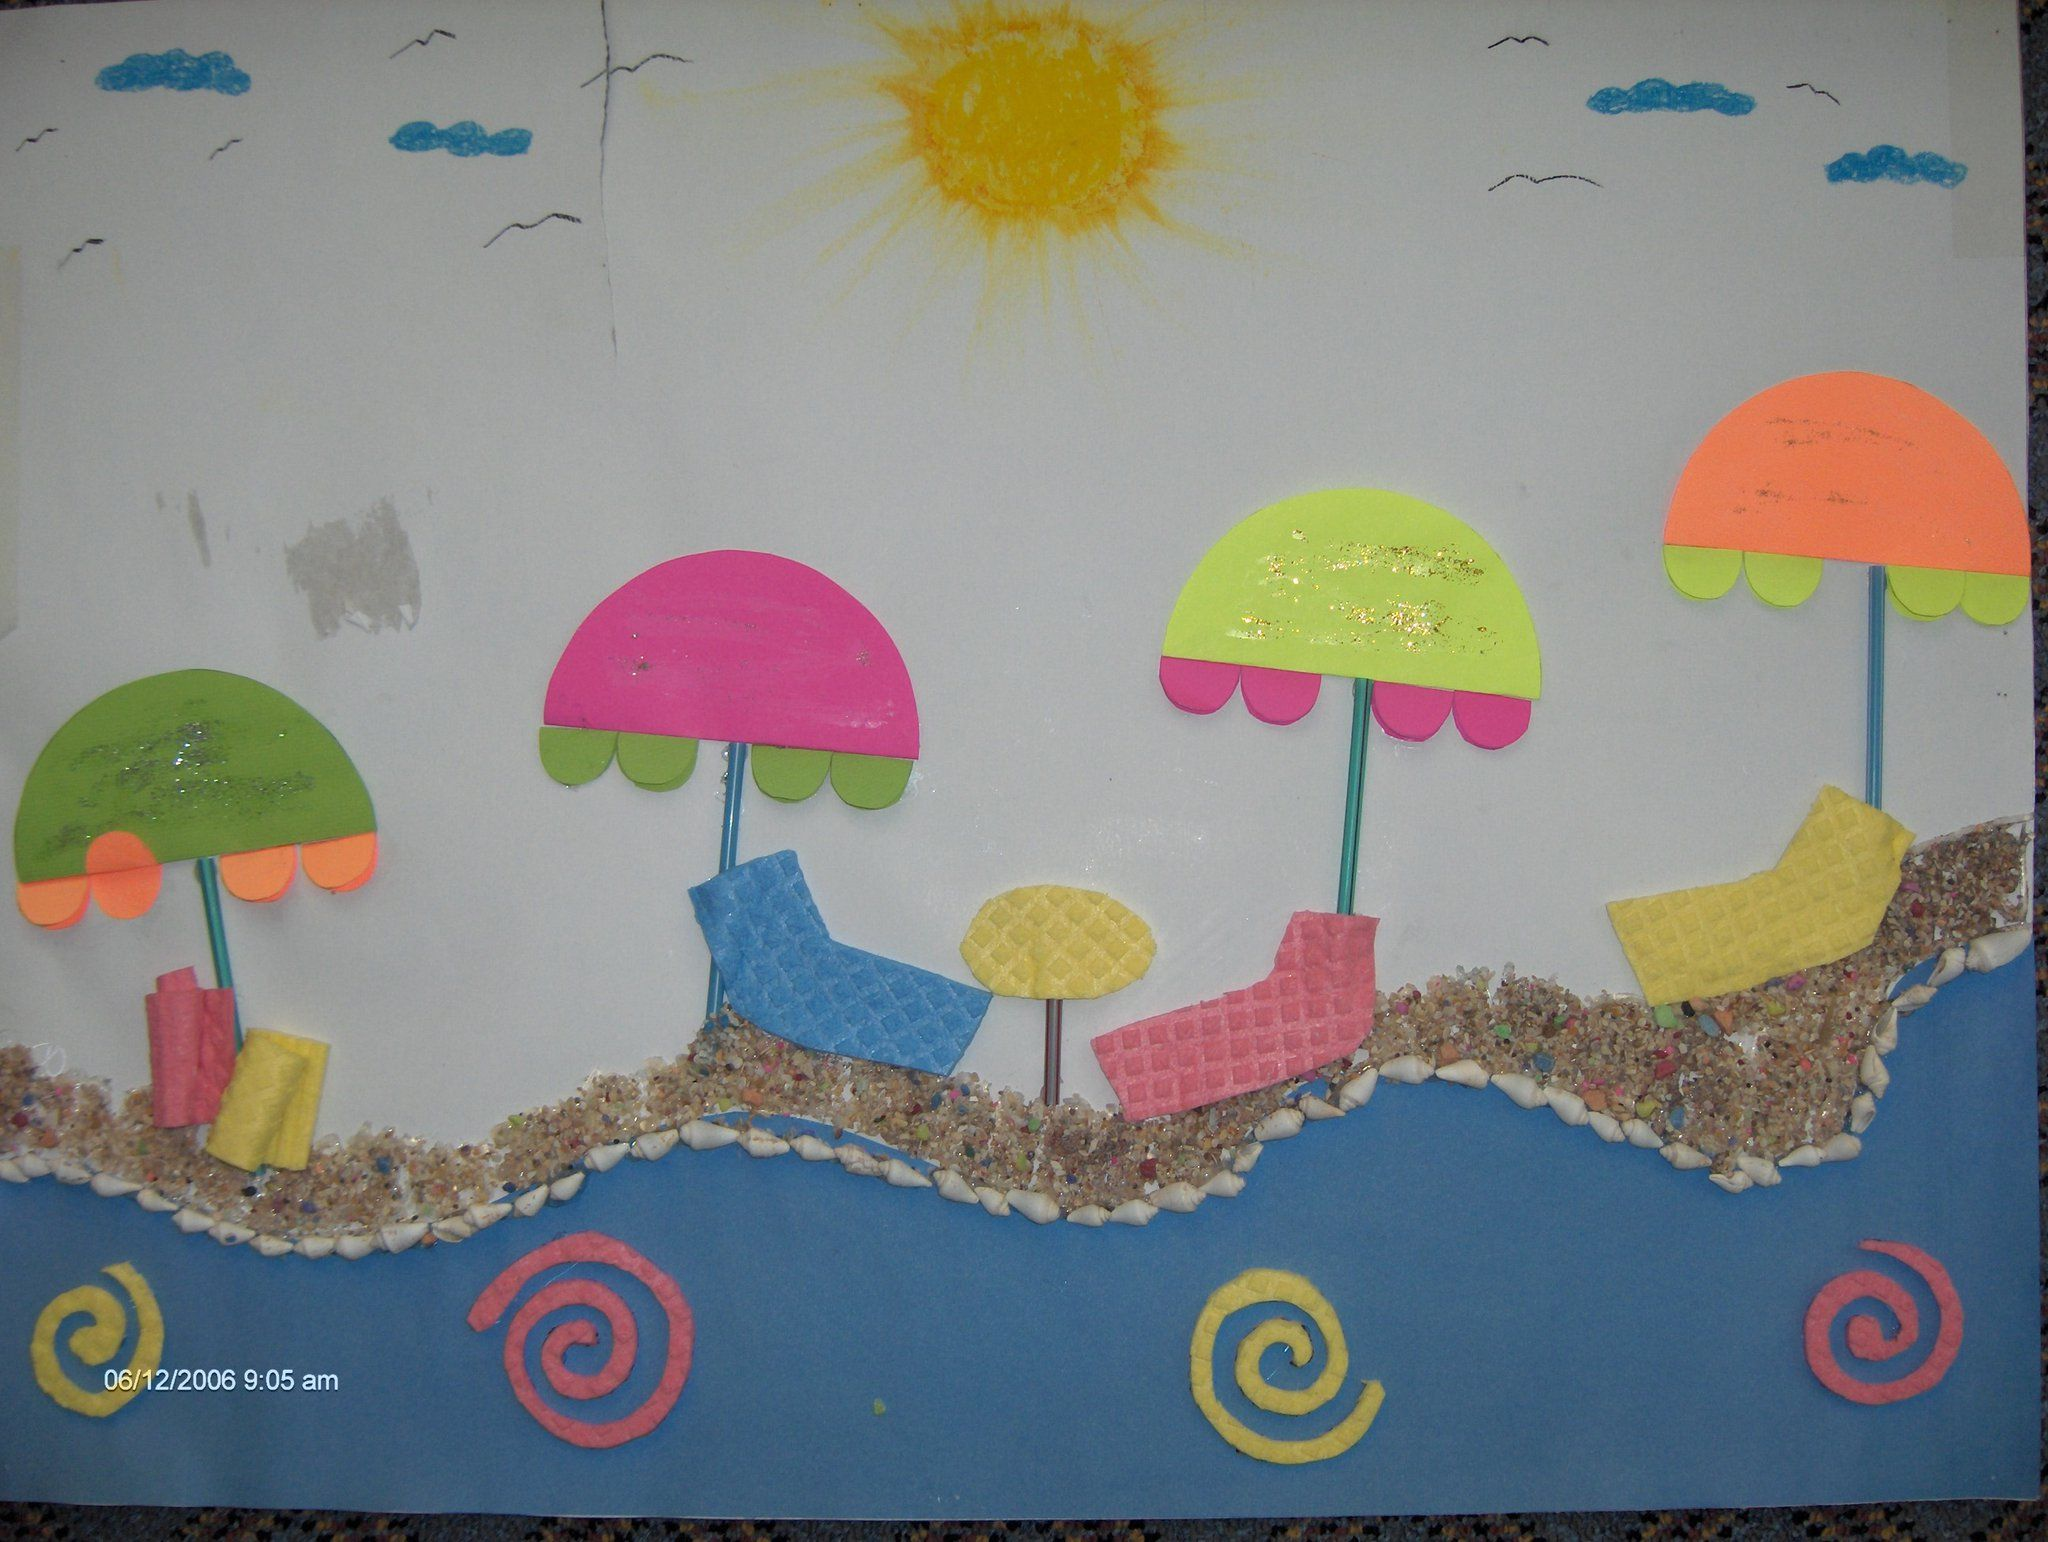 Beach Craft Ideas For Kids Part - 25: Beach Craft Idea Crafts And Worksheets For Preschooltoddler And Beach Craft  Idea Crafts And Worksheets For